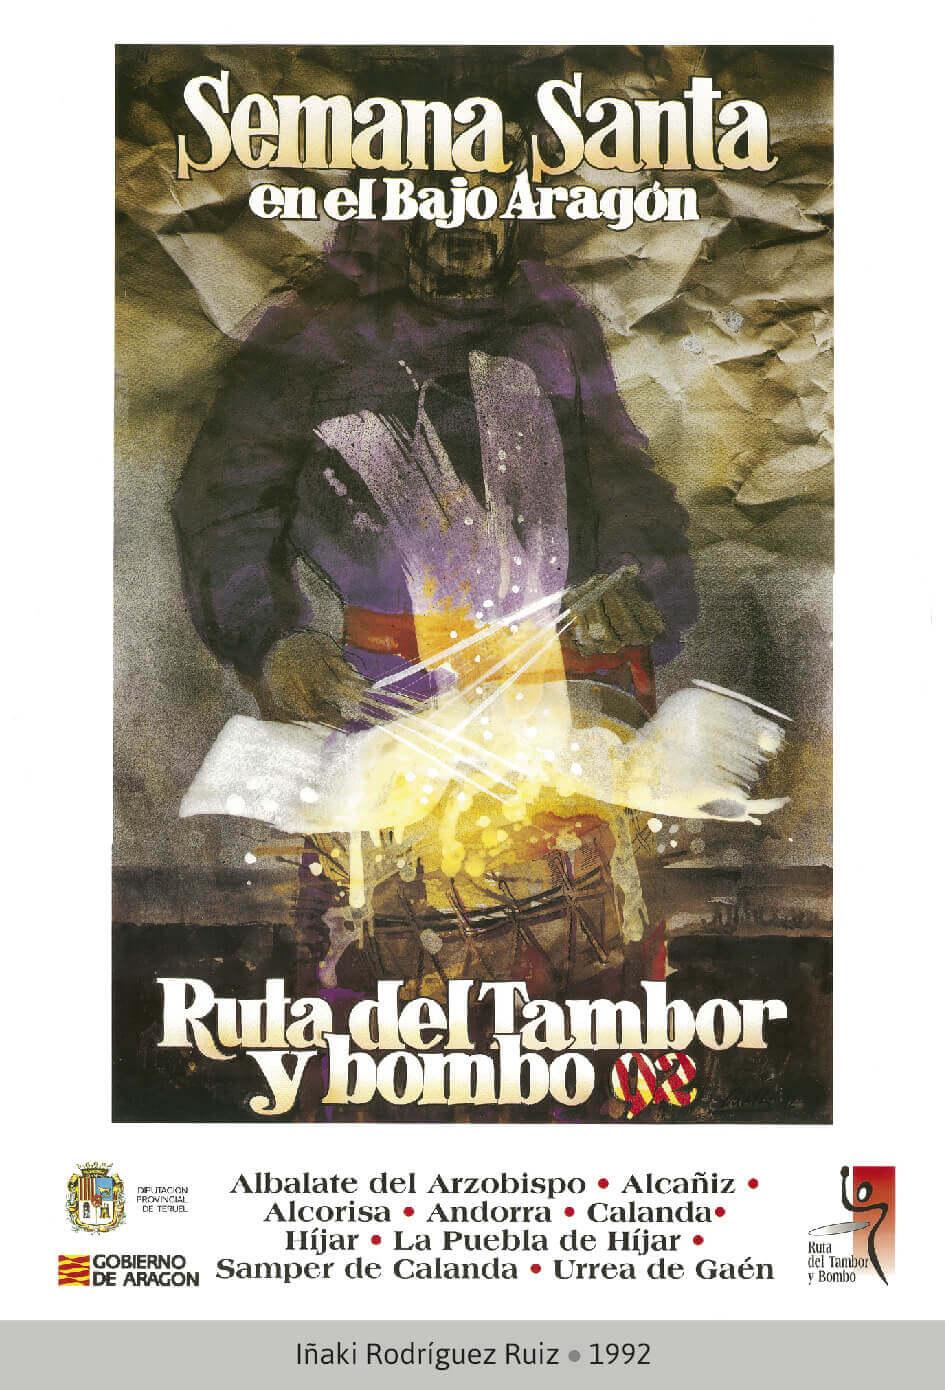 Cartel Ganador Ruta del Tambor y Bombo. Semana Santa 1992